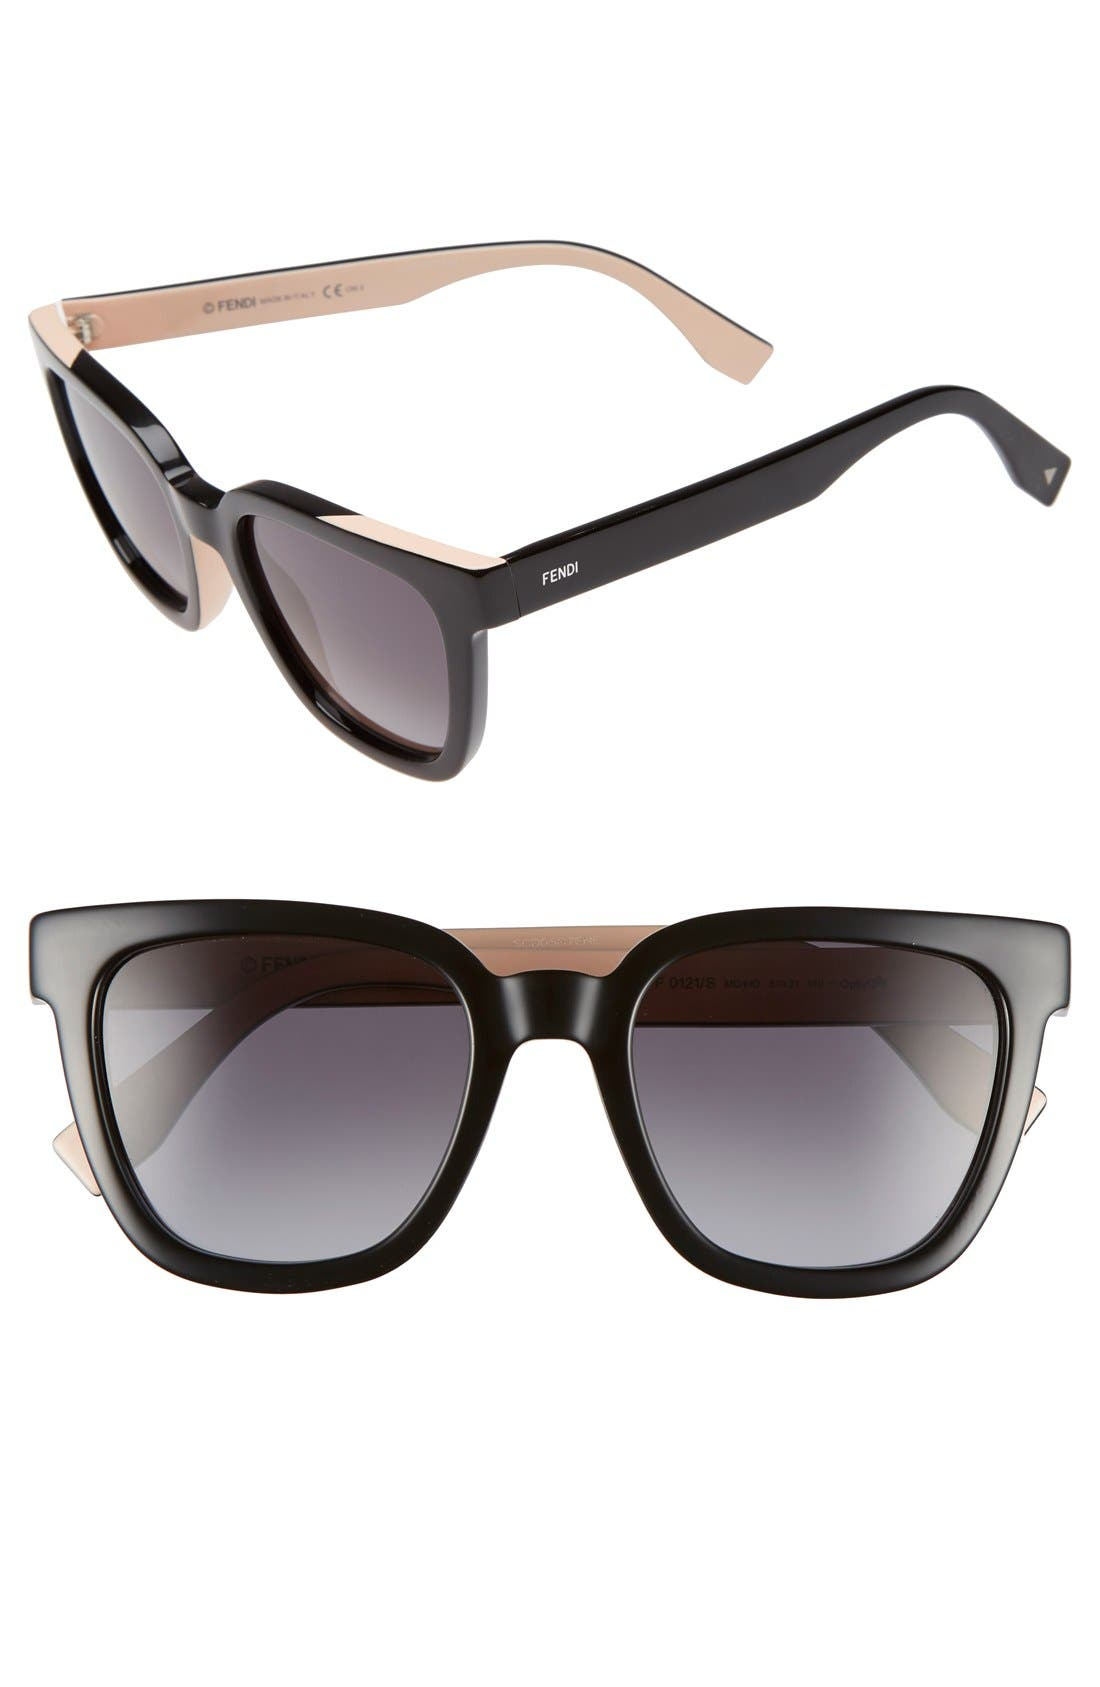 51mm Sunglasses,                             Main thumbnail 1, color,                             001